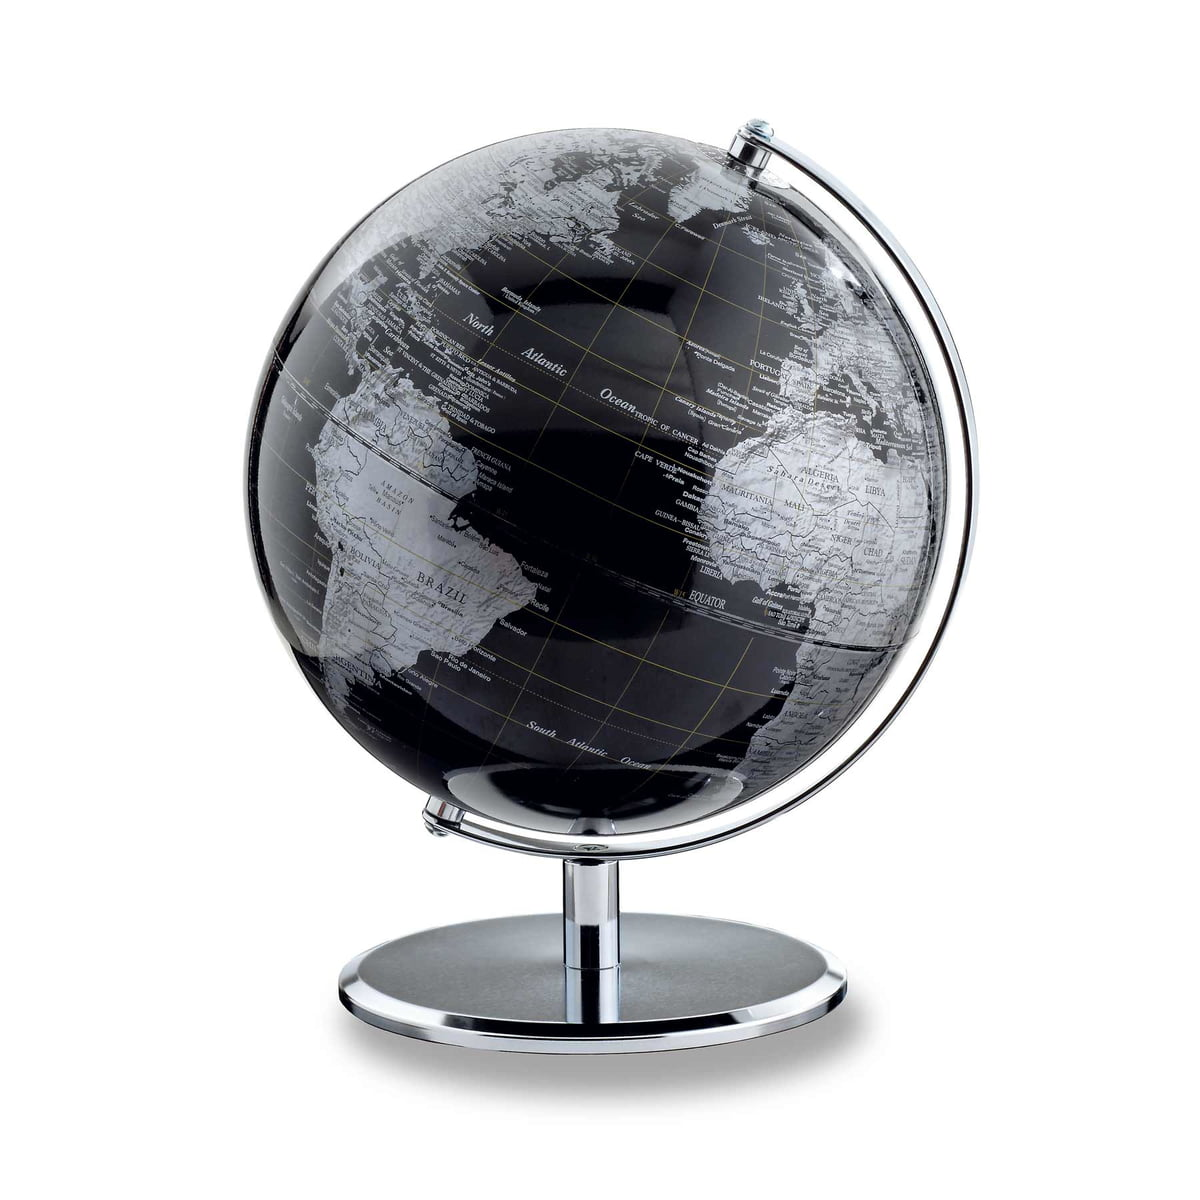 Darkchrome Globus